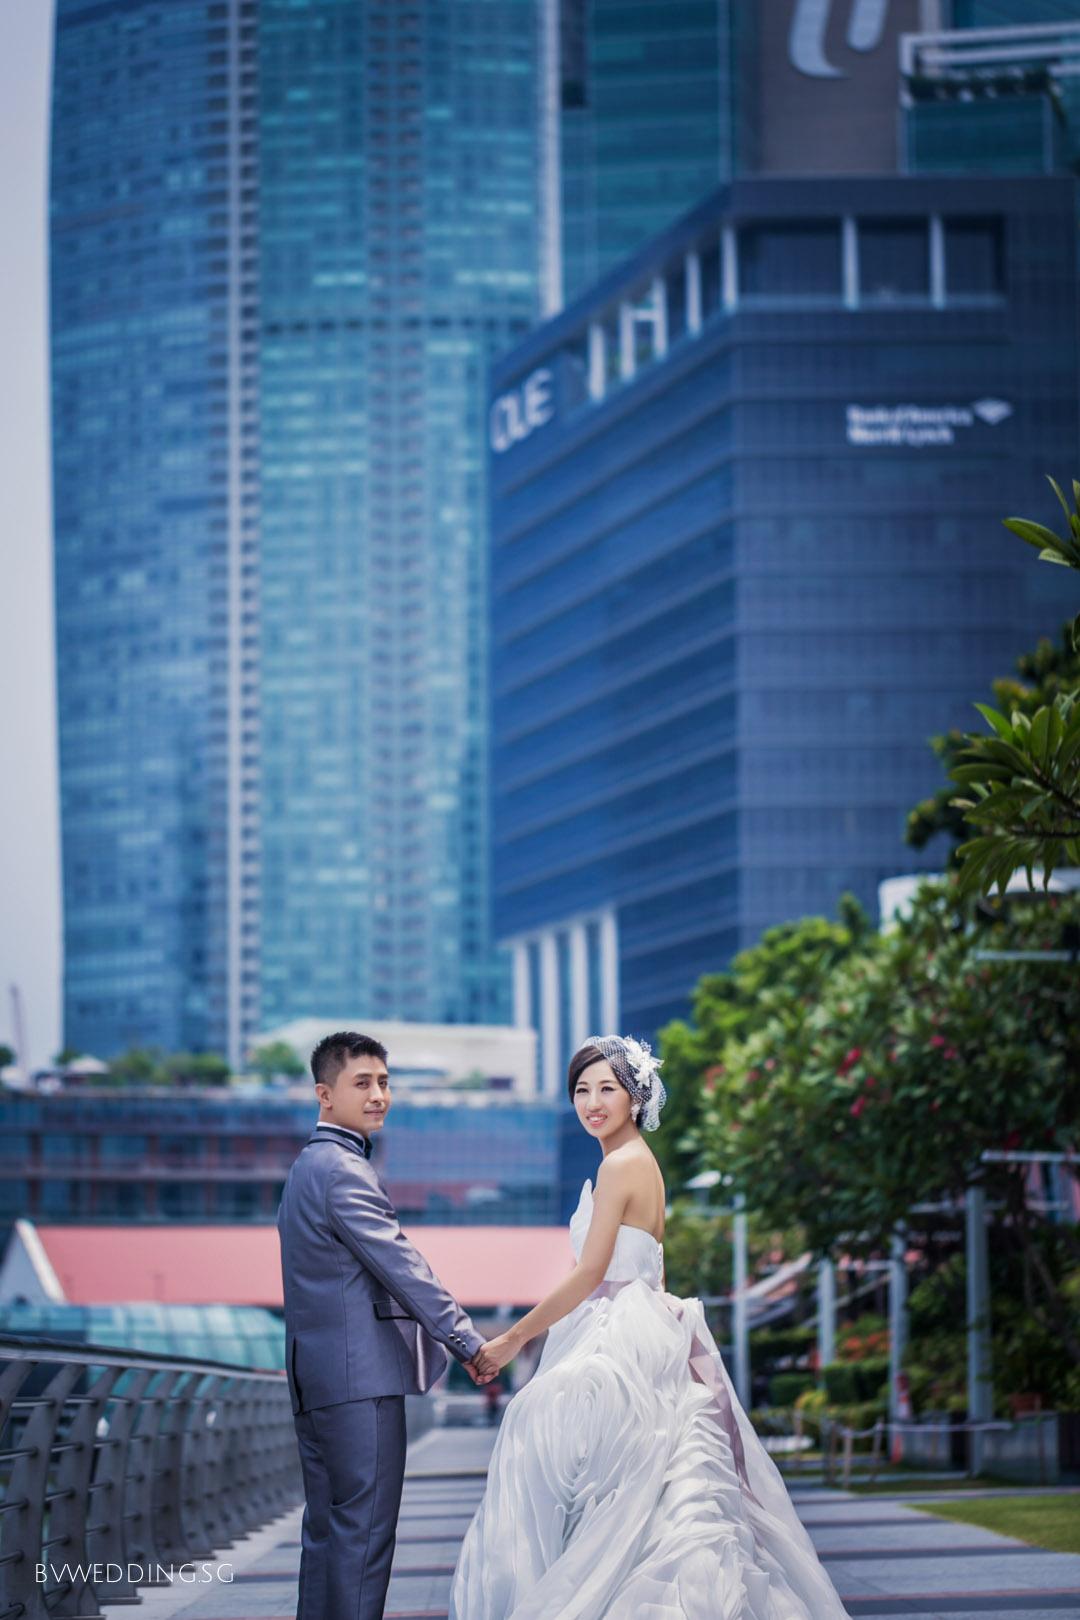 Pre-wedding Photoshoot at Merlion